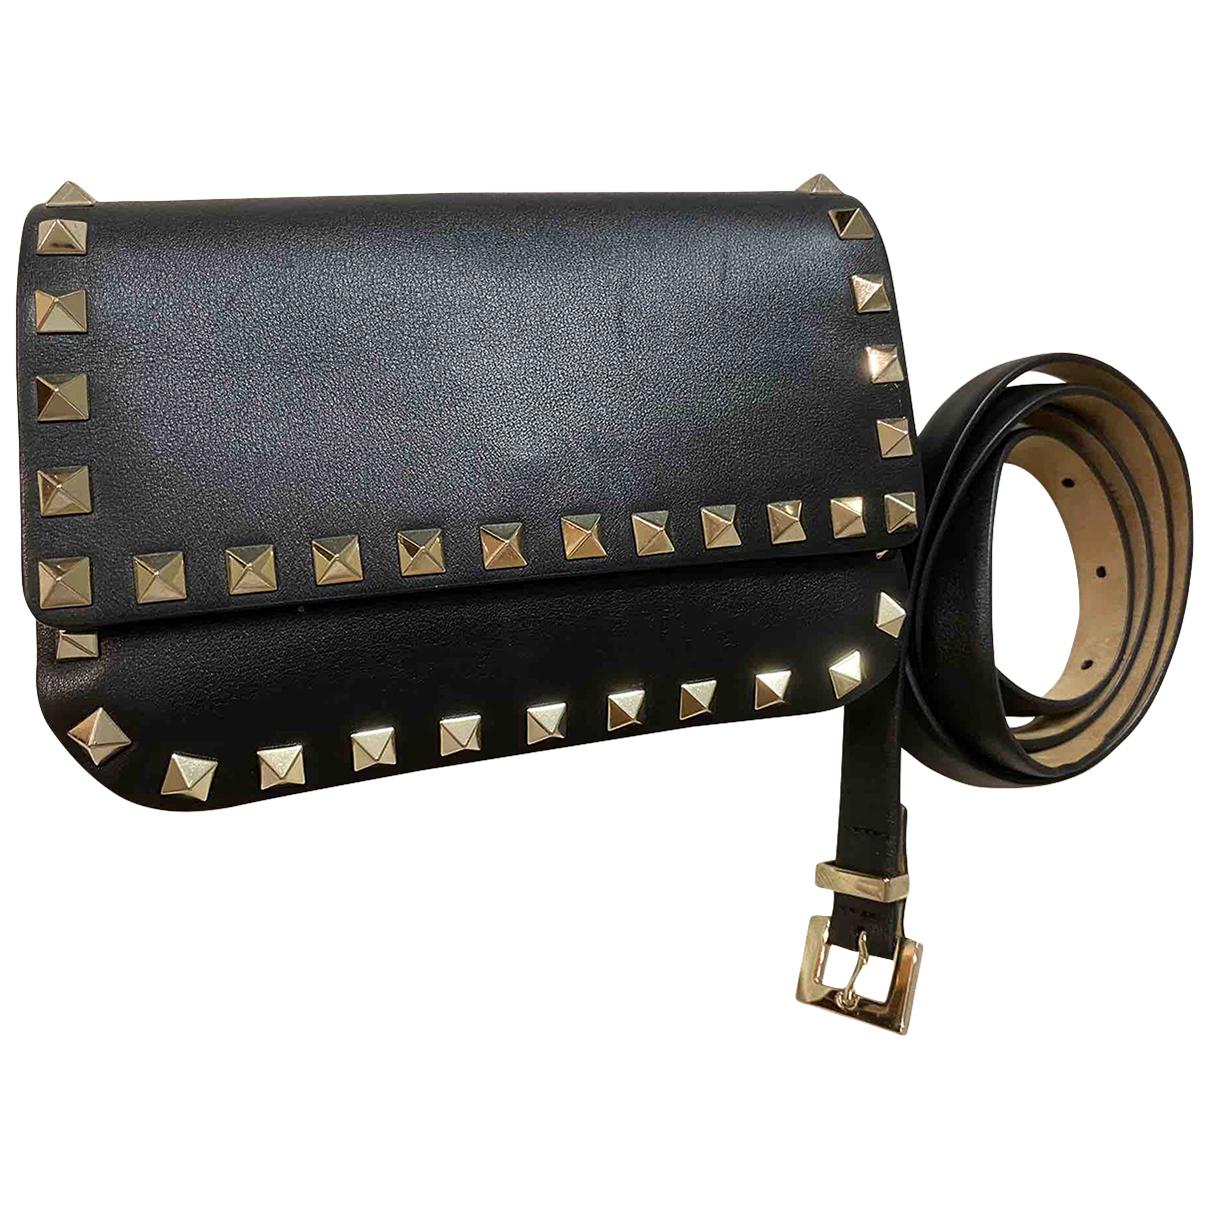 Valentino Garavani Rockstud Black Leather handbag for Women N